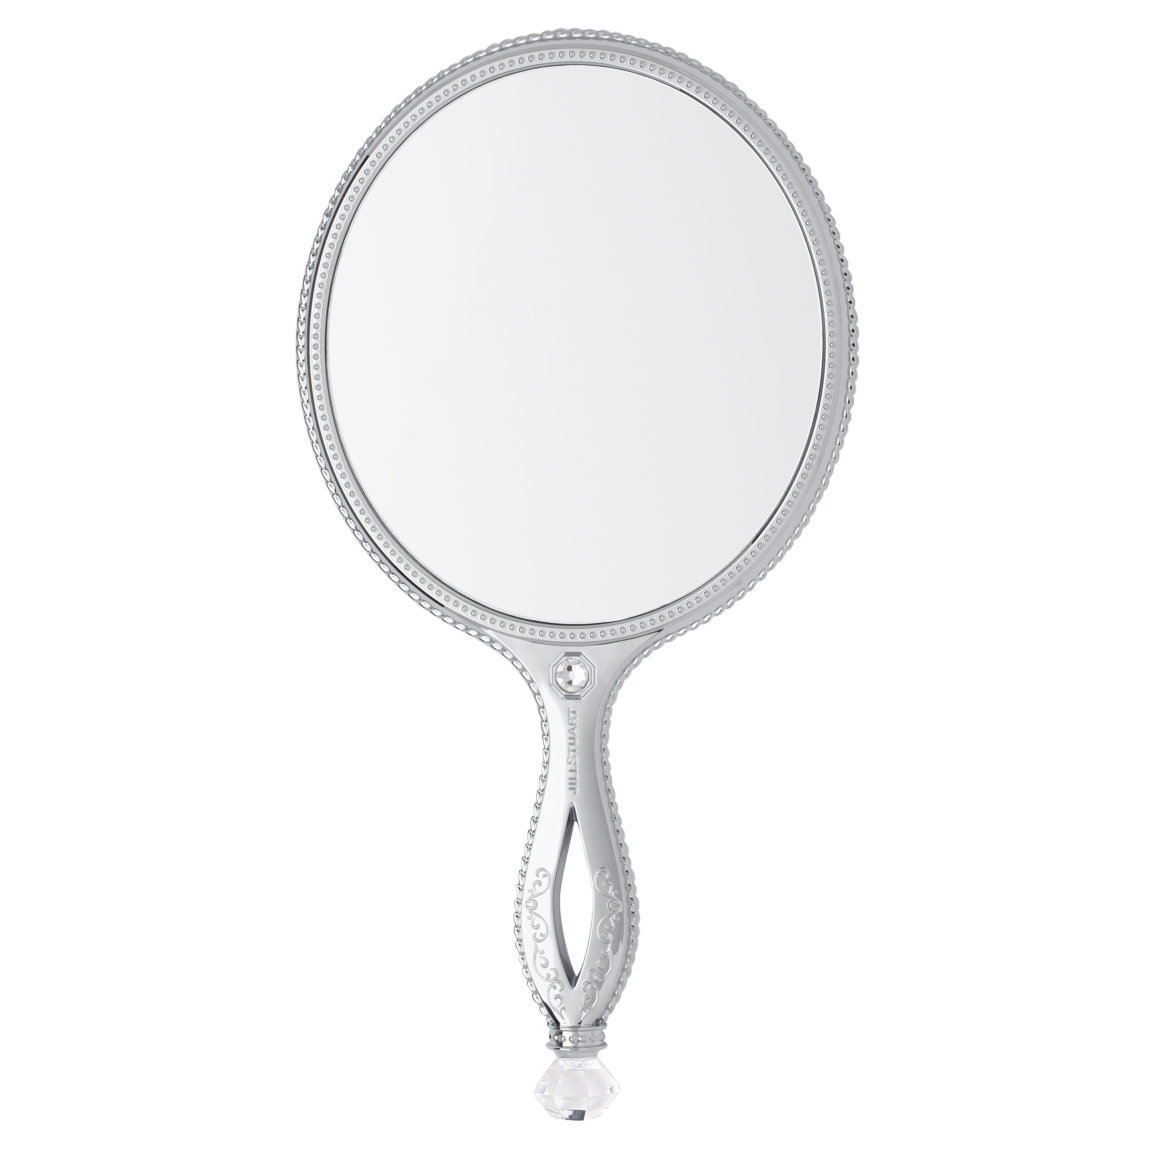 JILL STUART Beauty Hand Mirror product swatch.